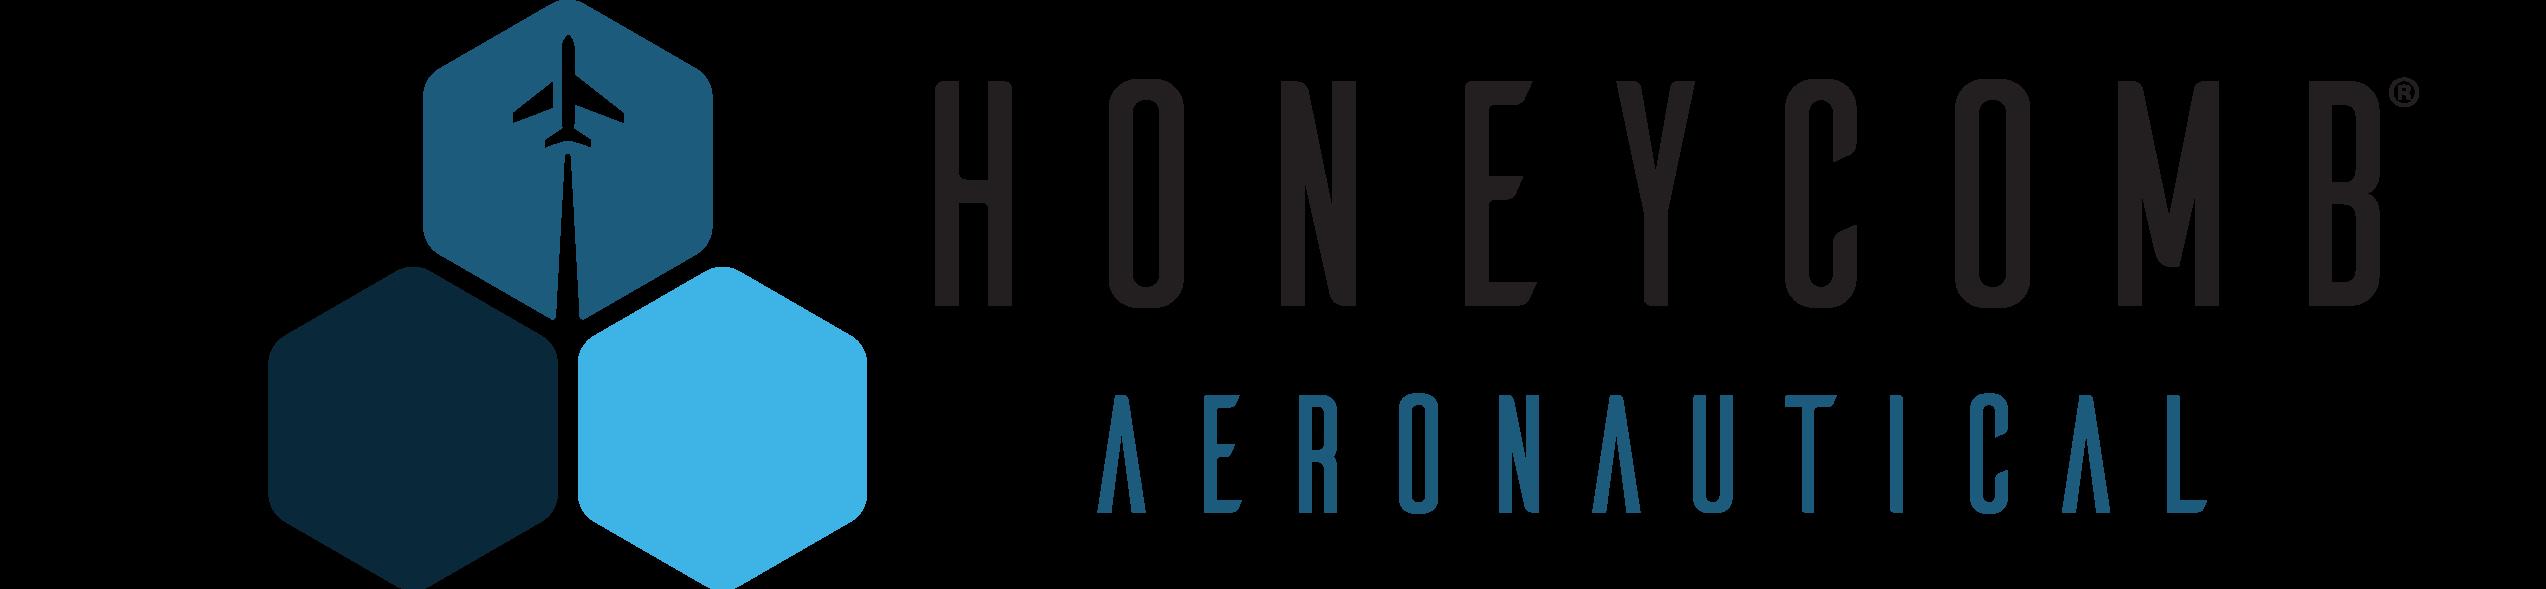 Honeycomb-logo-1-1